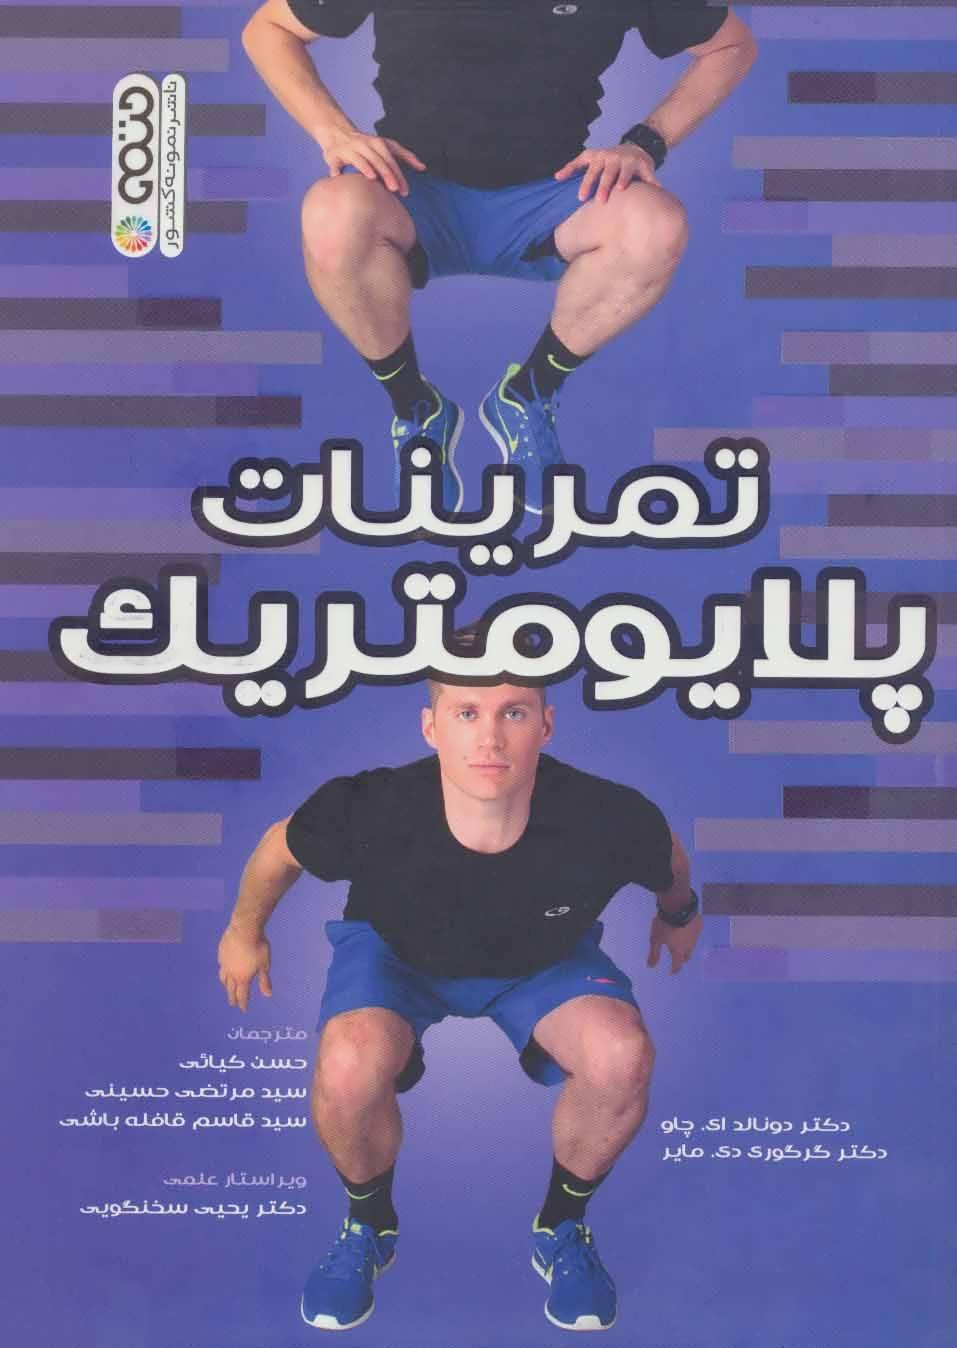 کتاب تمرینات پلایومتریک